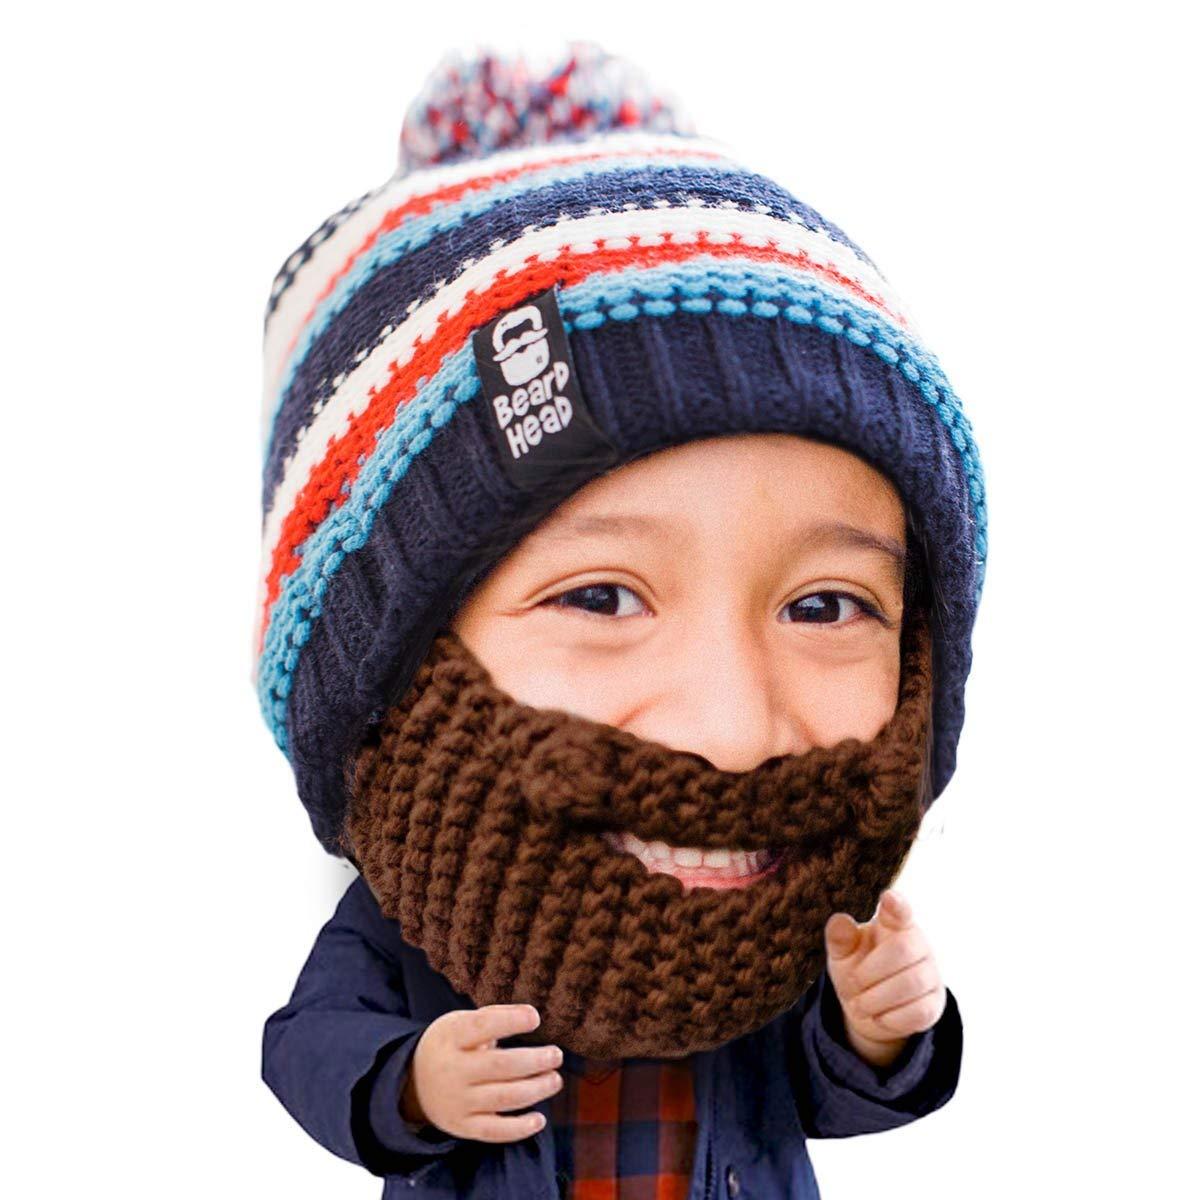 73f088706bc5a Get Quotations · Beard Head Kid Gromm Beard Beanie - Knit Hat w Fake Beard  for Kids and